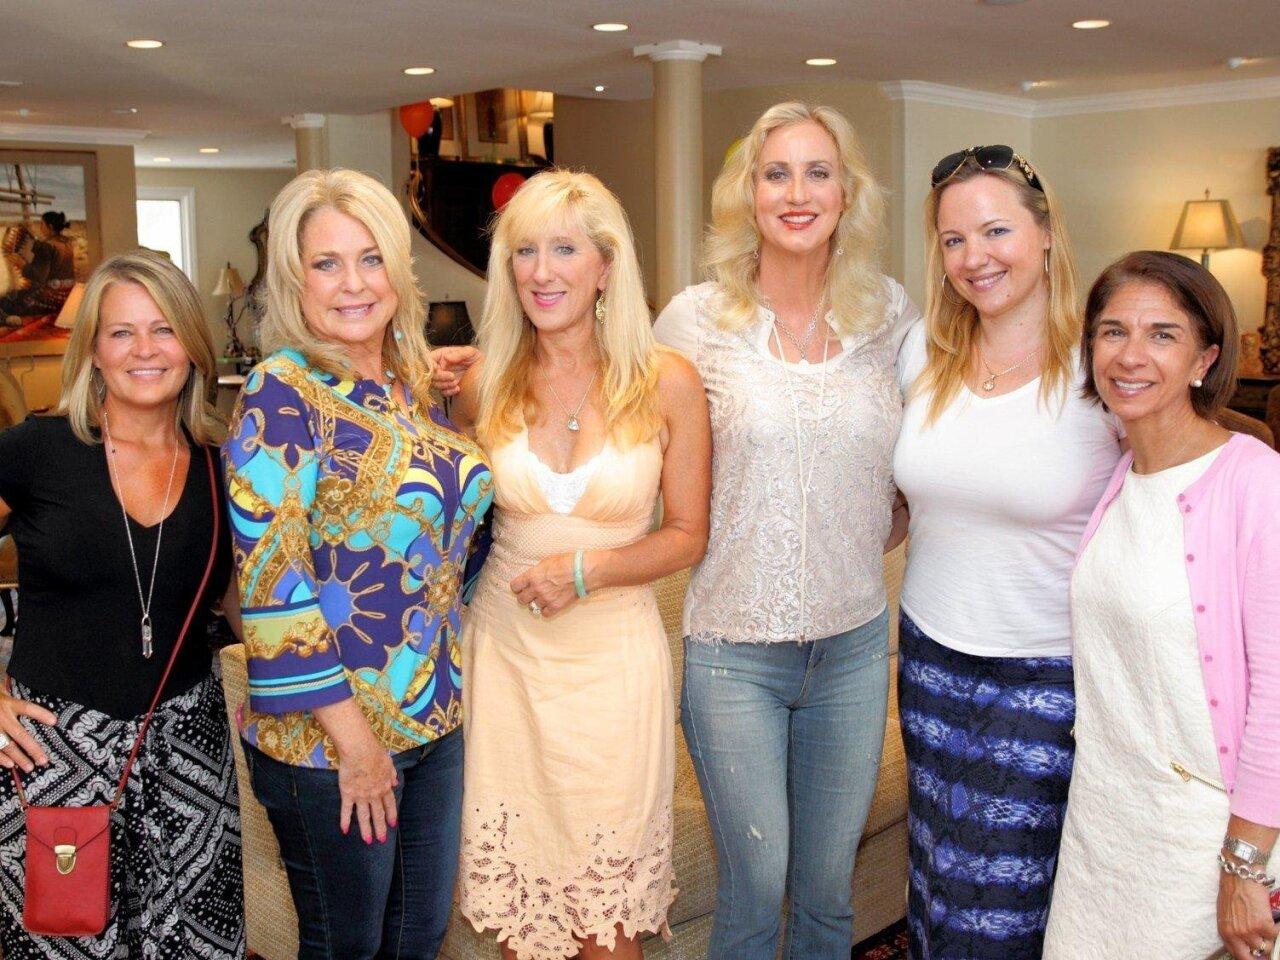 Julie Monroe, Kerri Woodland, Sarah Sleeper, Sophia Alsadek, Beata Pevny, Susan Appleby